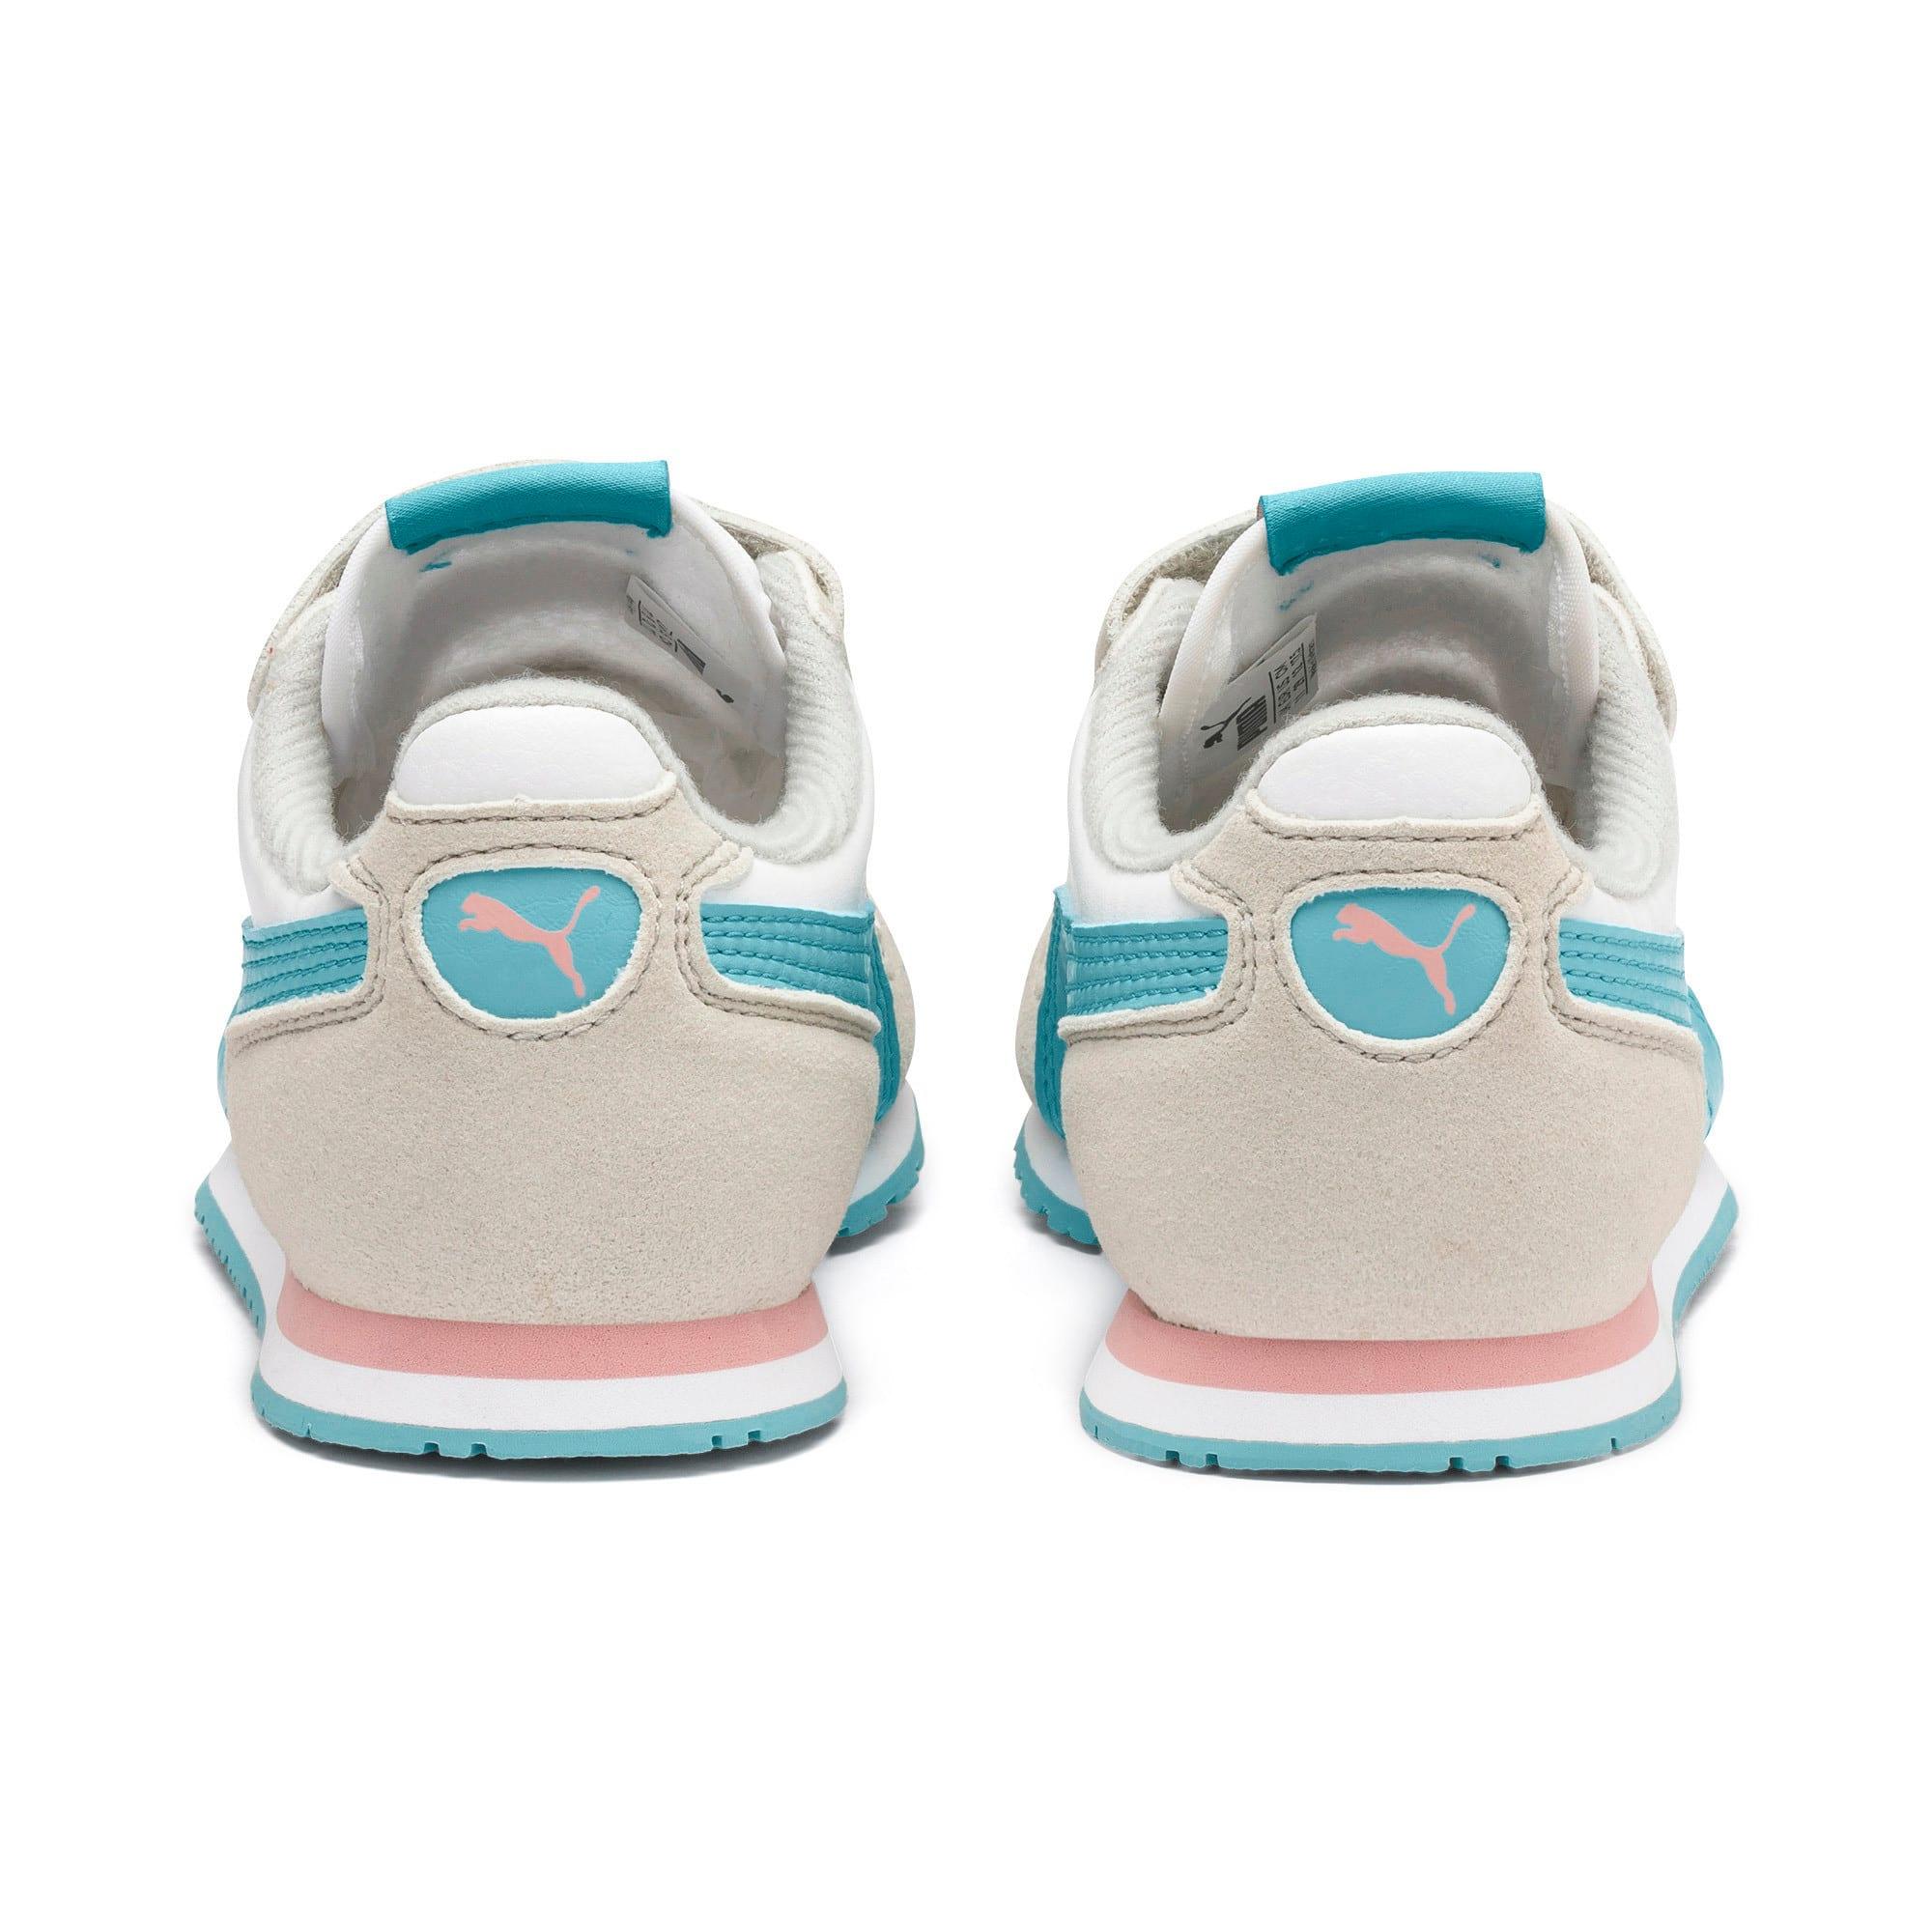 Thumbnail 3 of Cabana Racer SL AC Little Kids' Shoes, Puma White-Milky Blue, medium